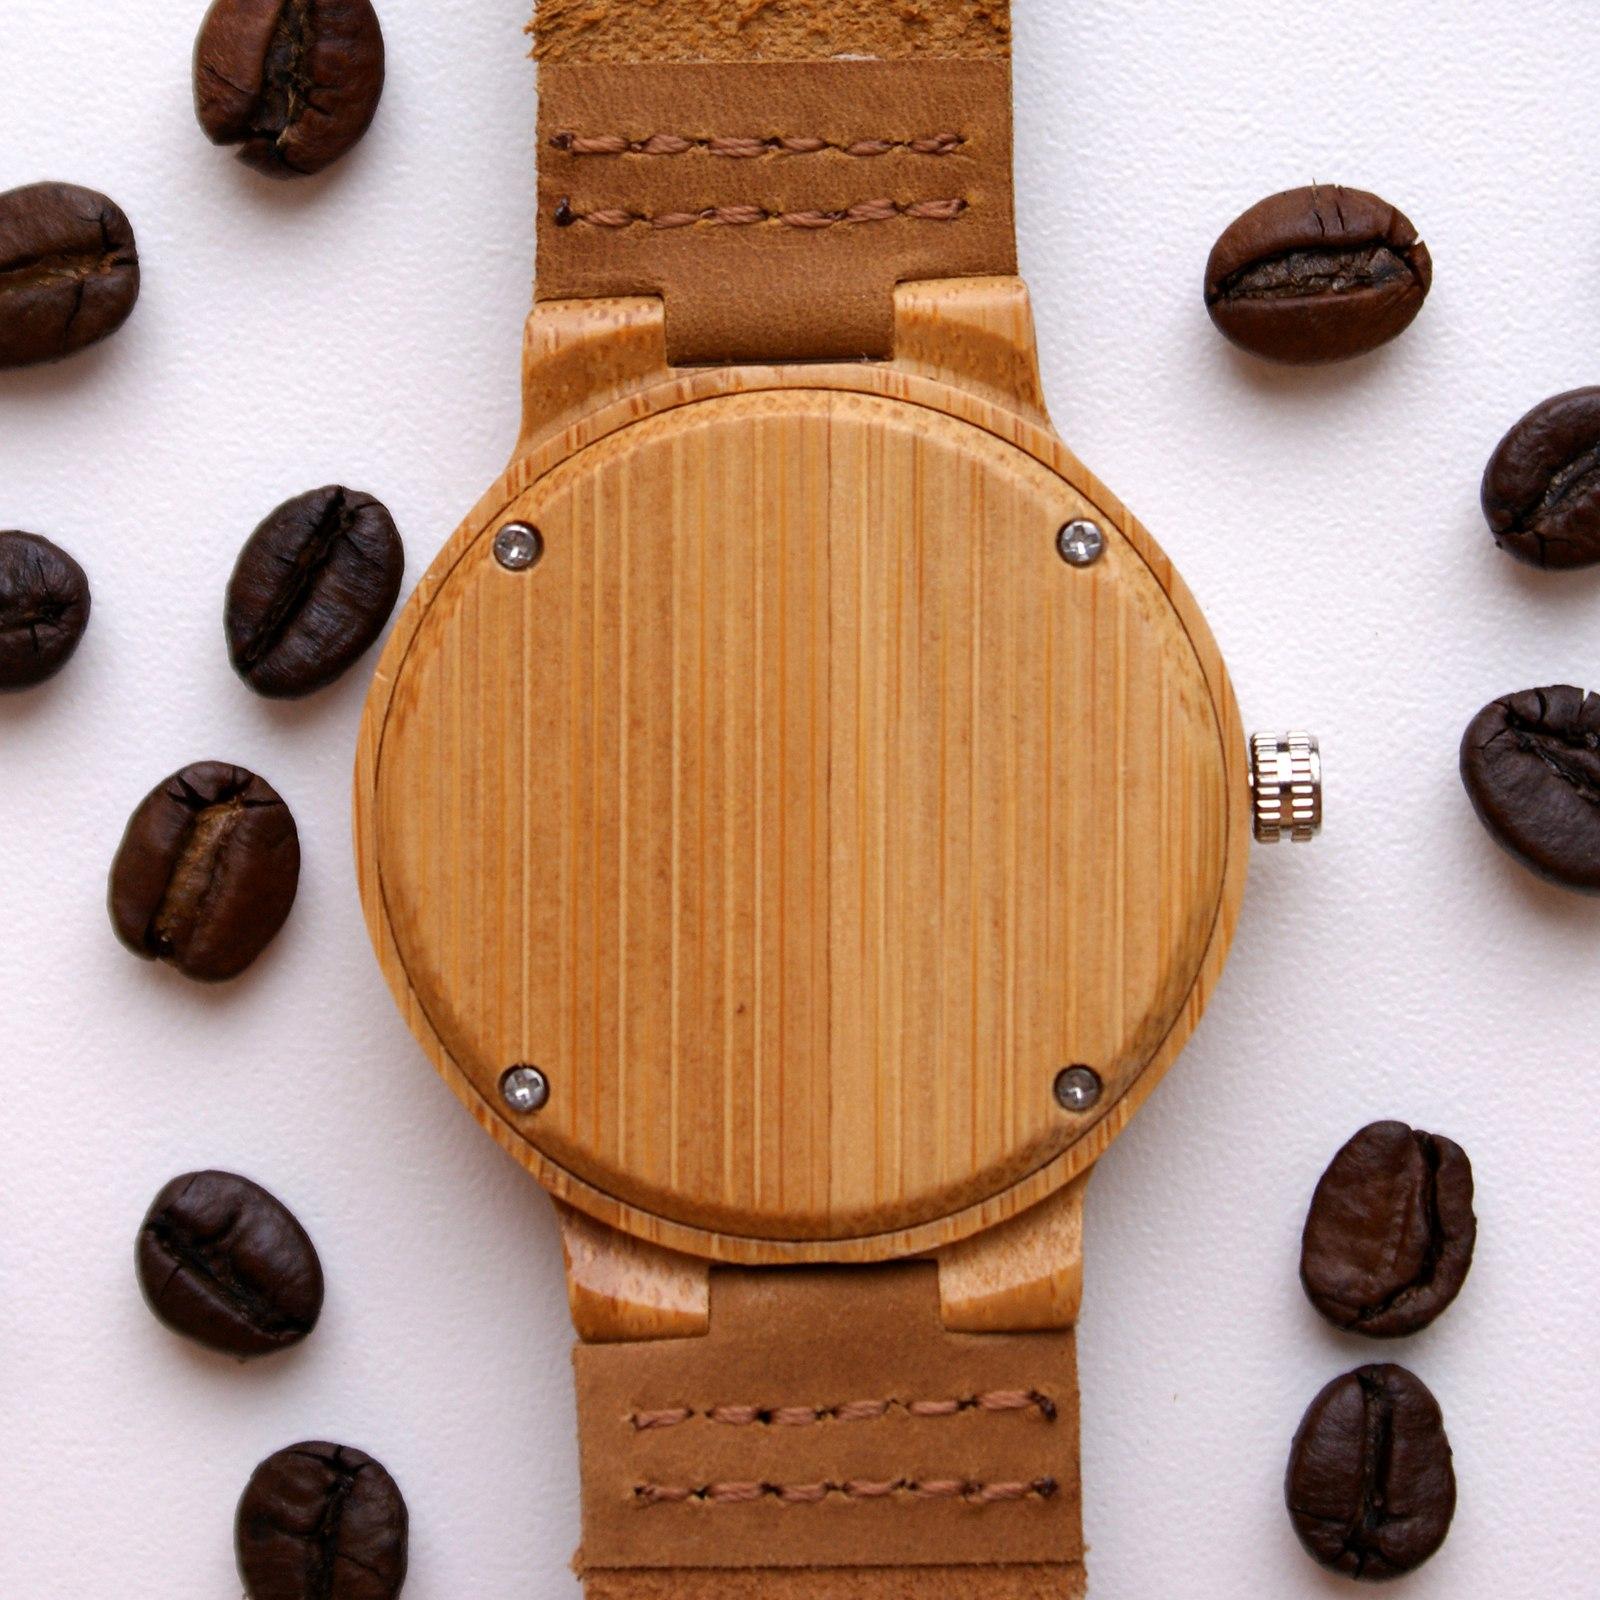 Бамбуковые часы Sonorous - стильный аксессуар за 115